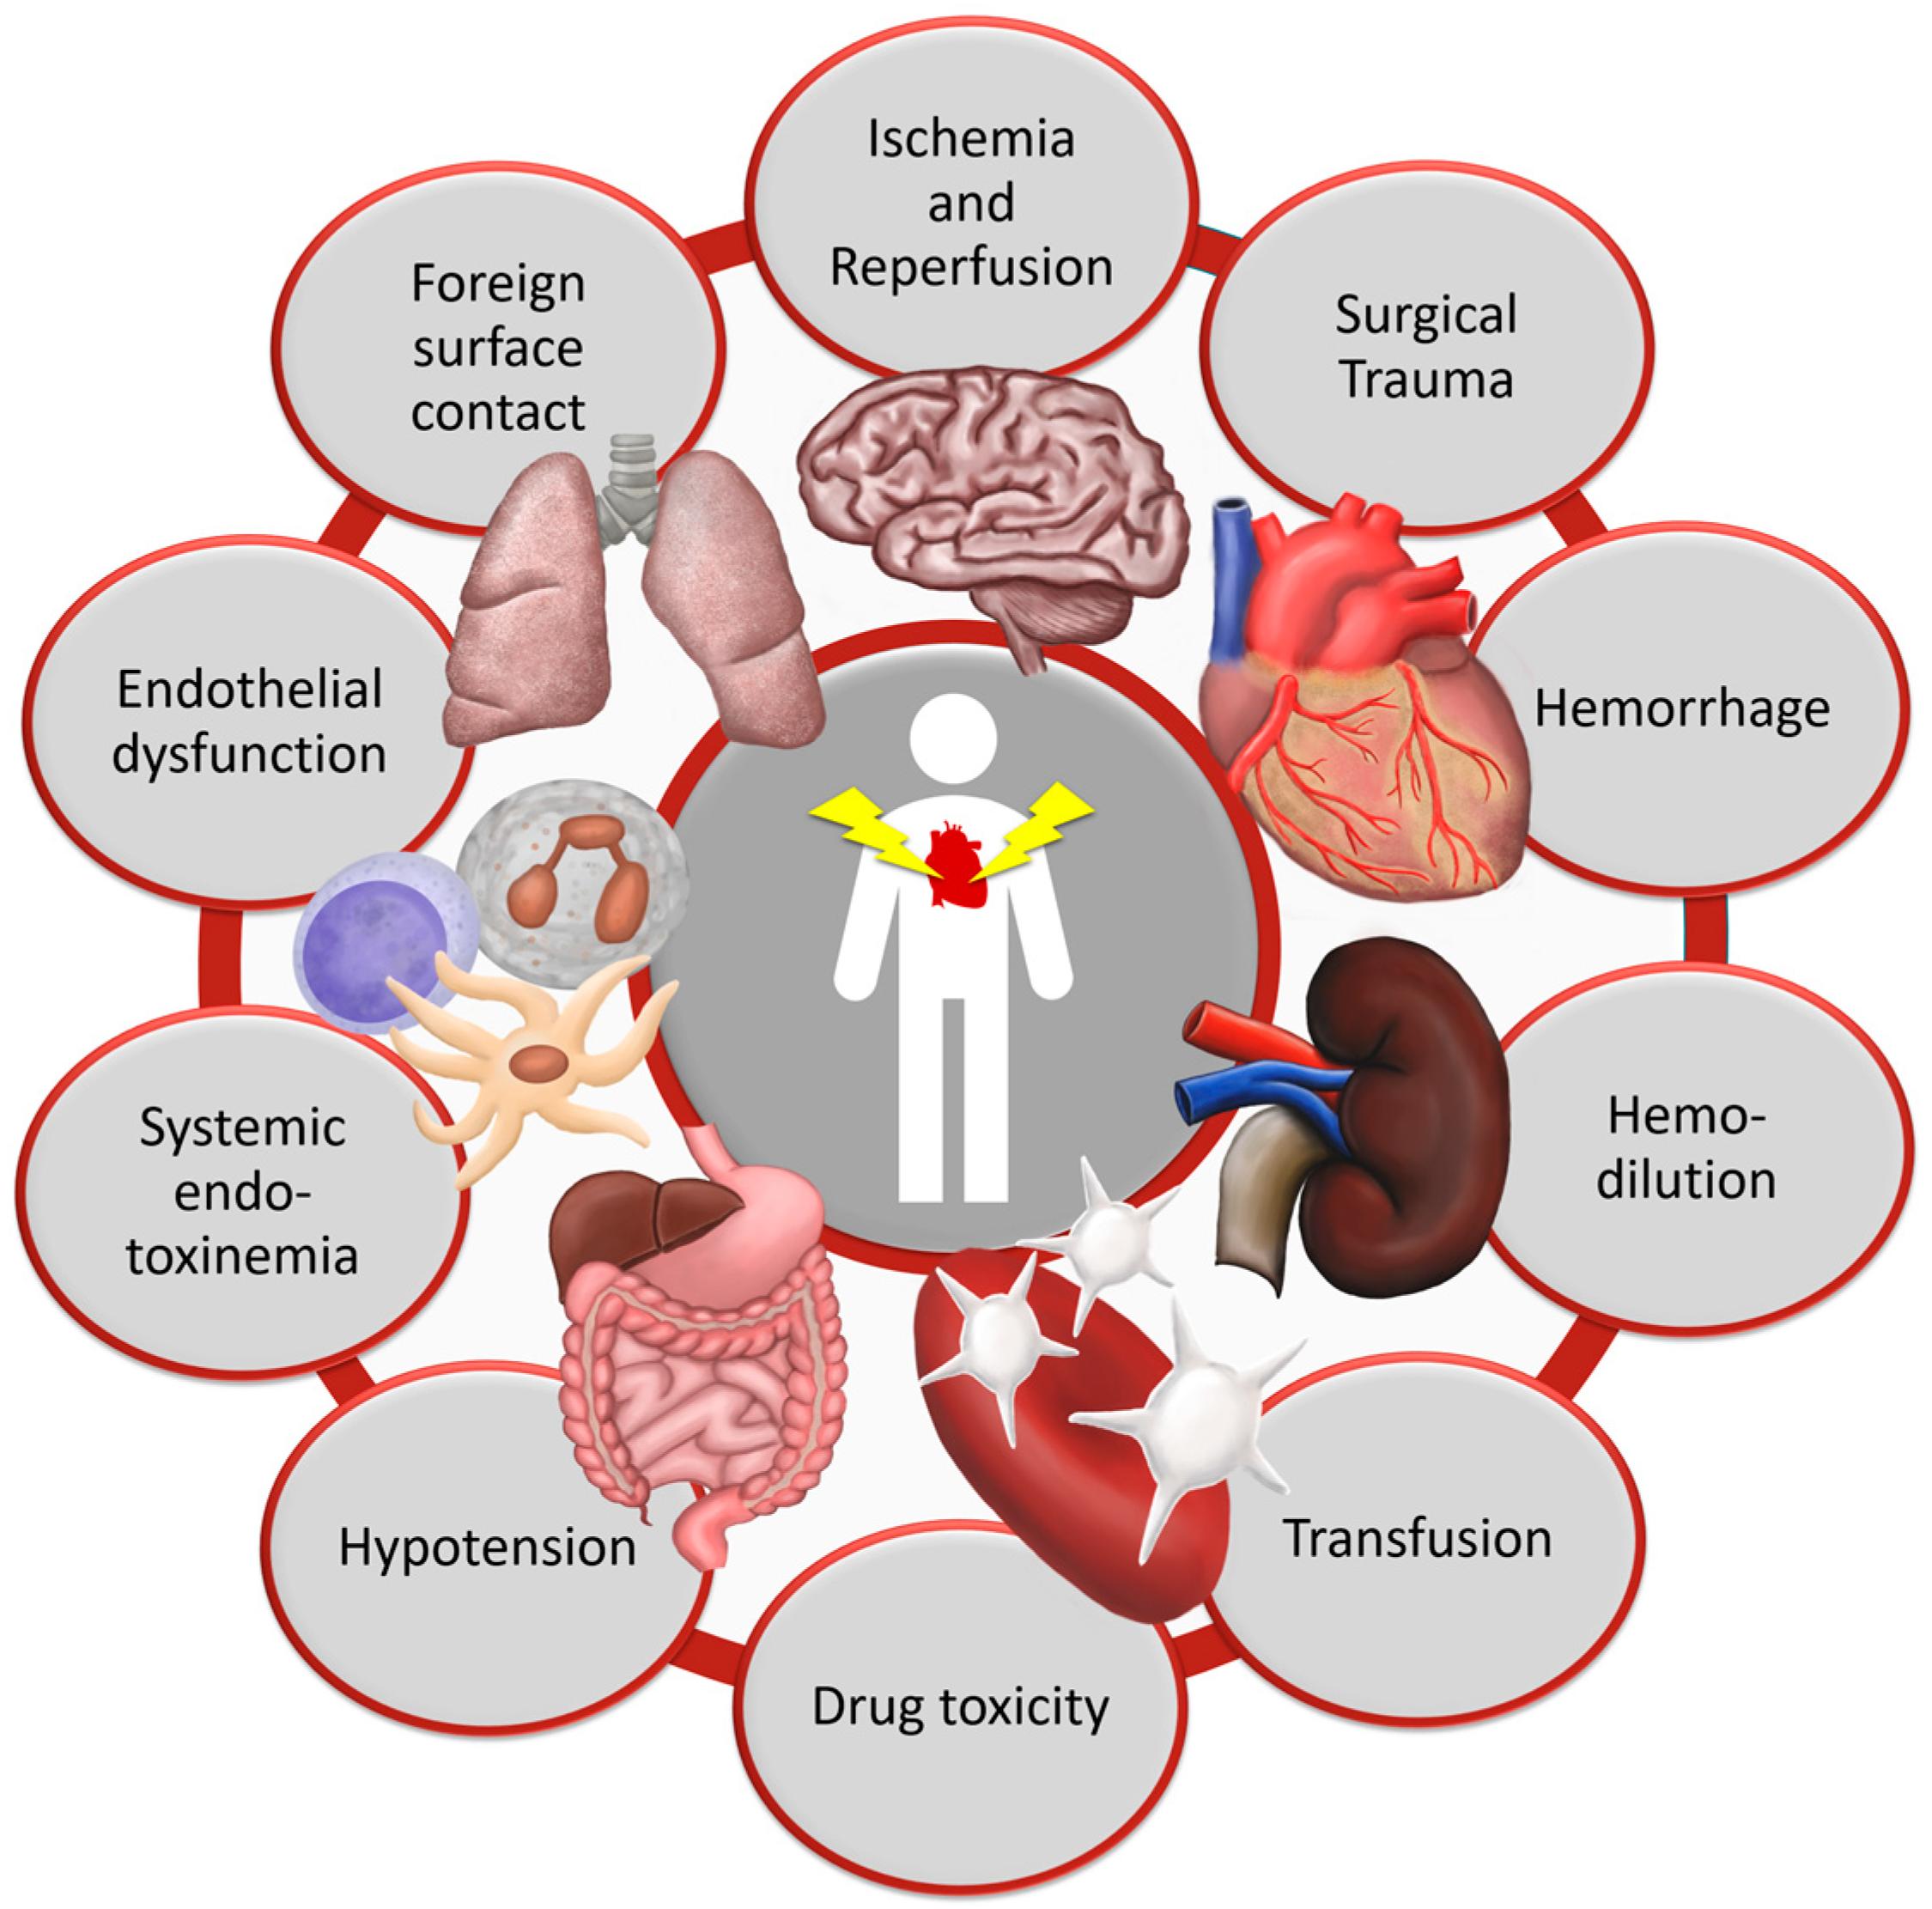 Nutrients | Free Full-Text | Vitamin C to Improve Organ ...